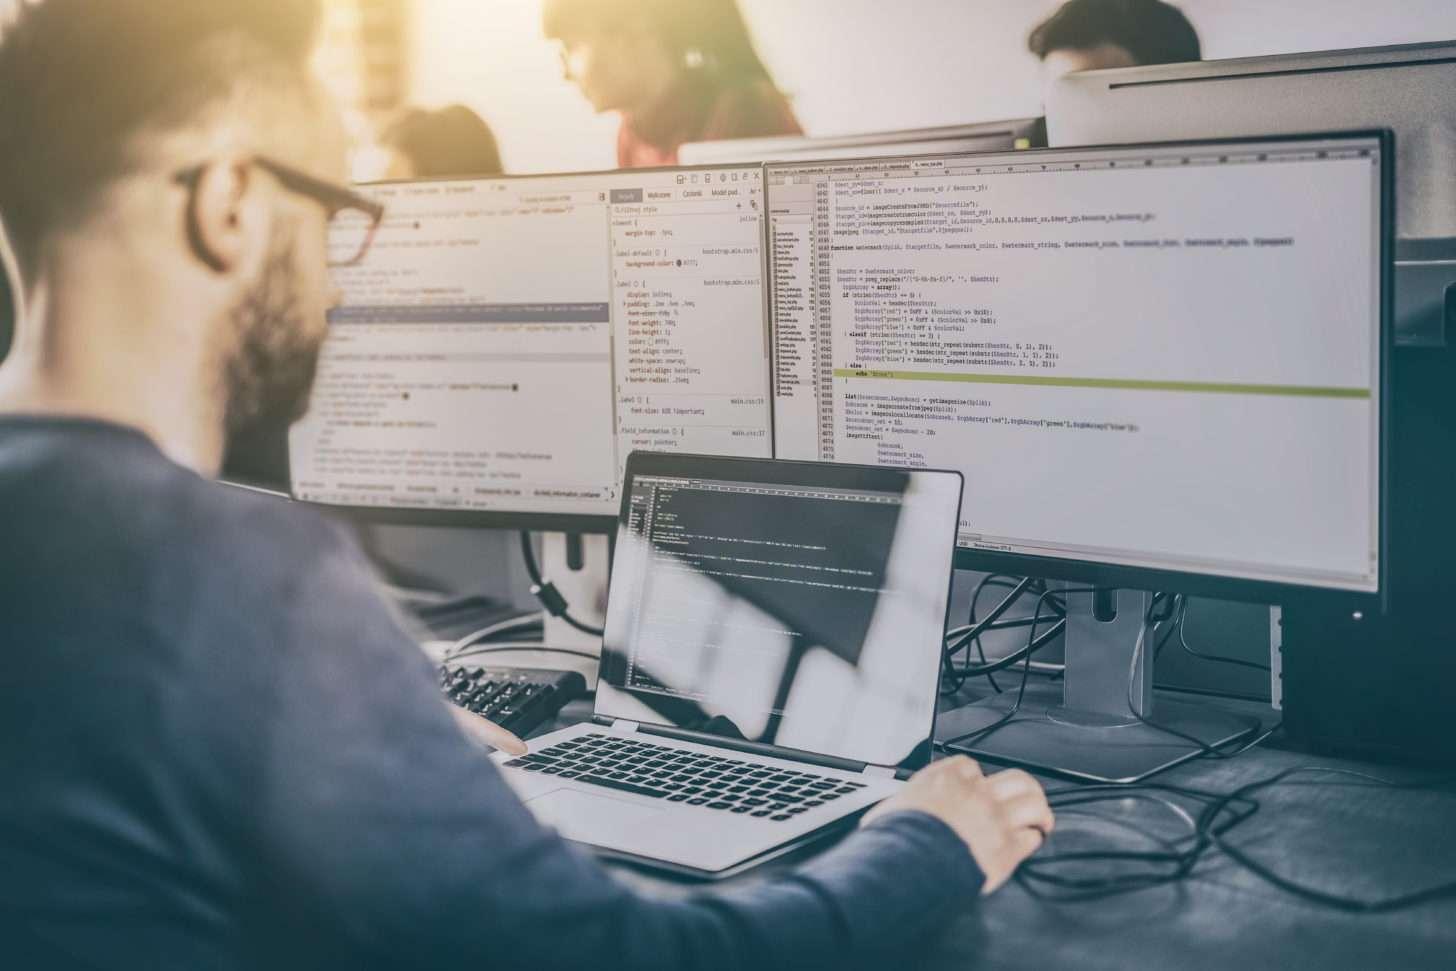 Web developer computer science jobs